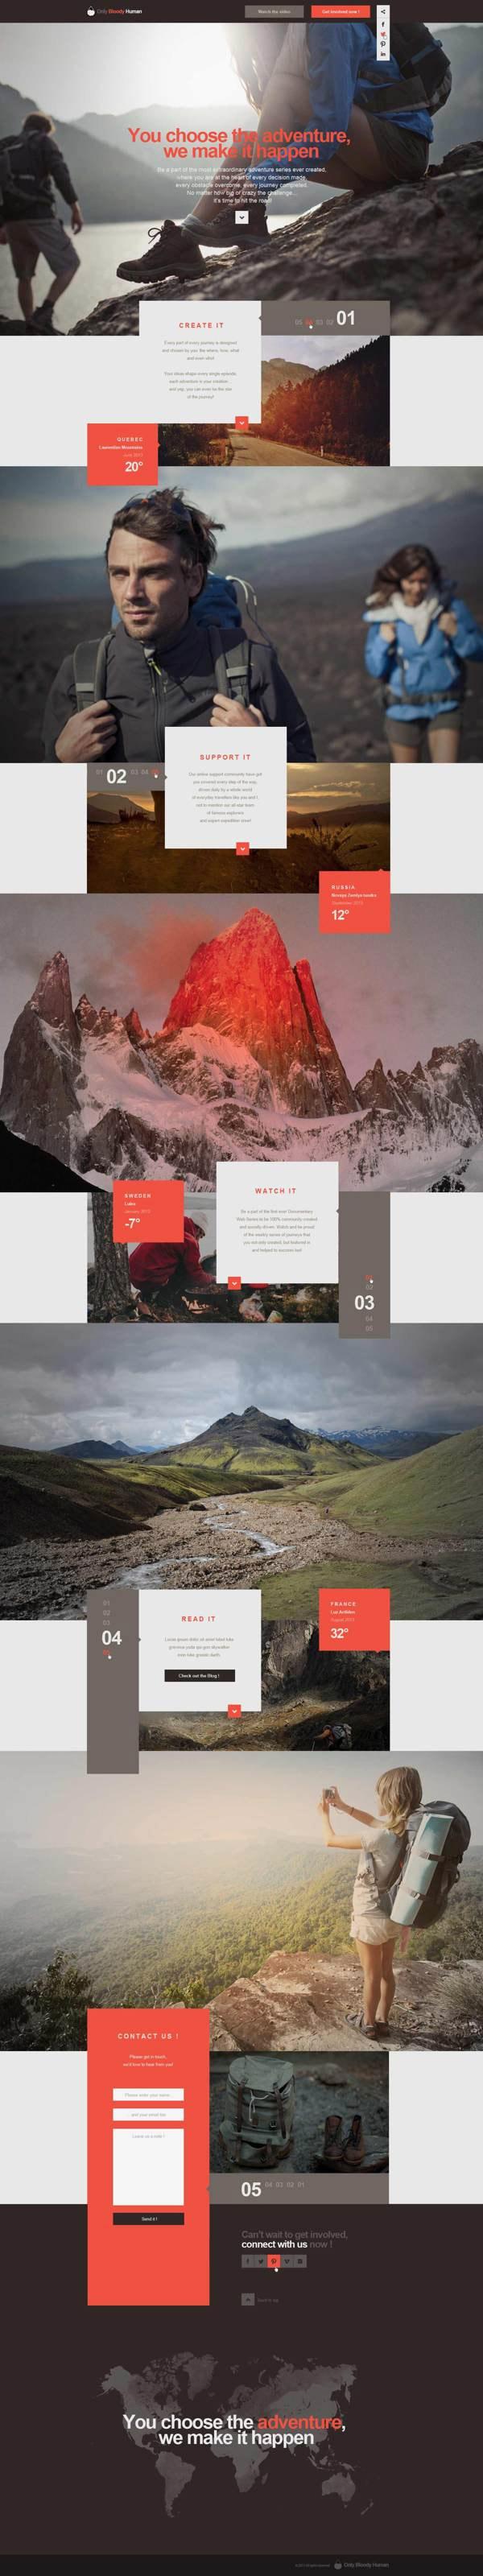 OBH Landing Page Concept by Thomas Le Corre